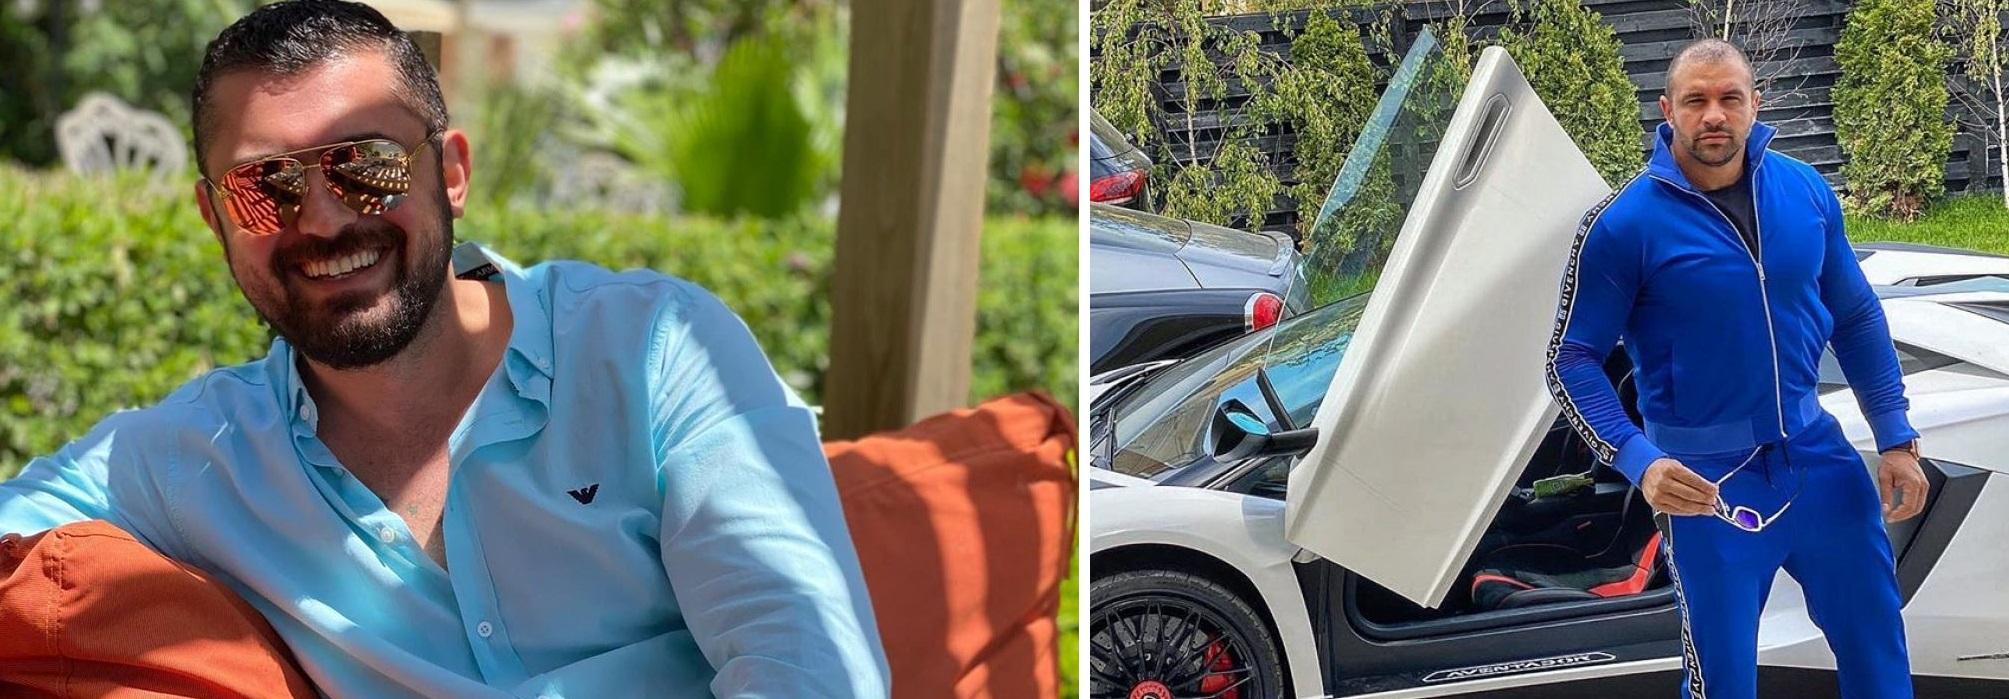 Cengiz Şıklaroğlu și Alex Bodi ar fi avut o întâlnire de neuitat